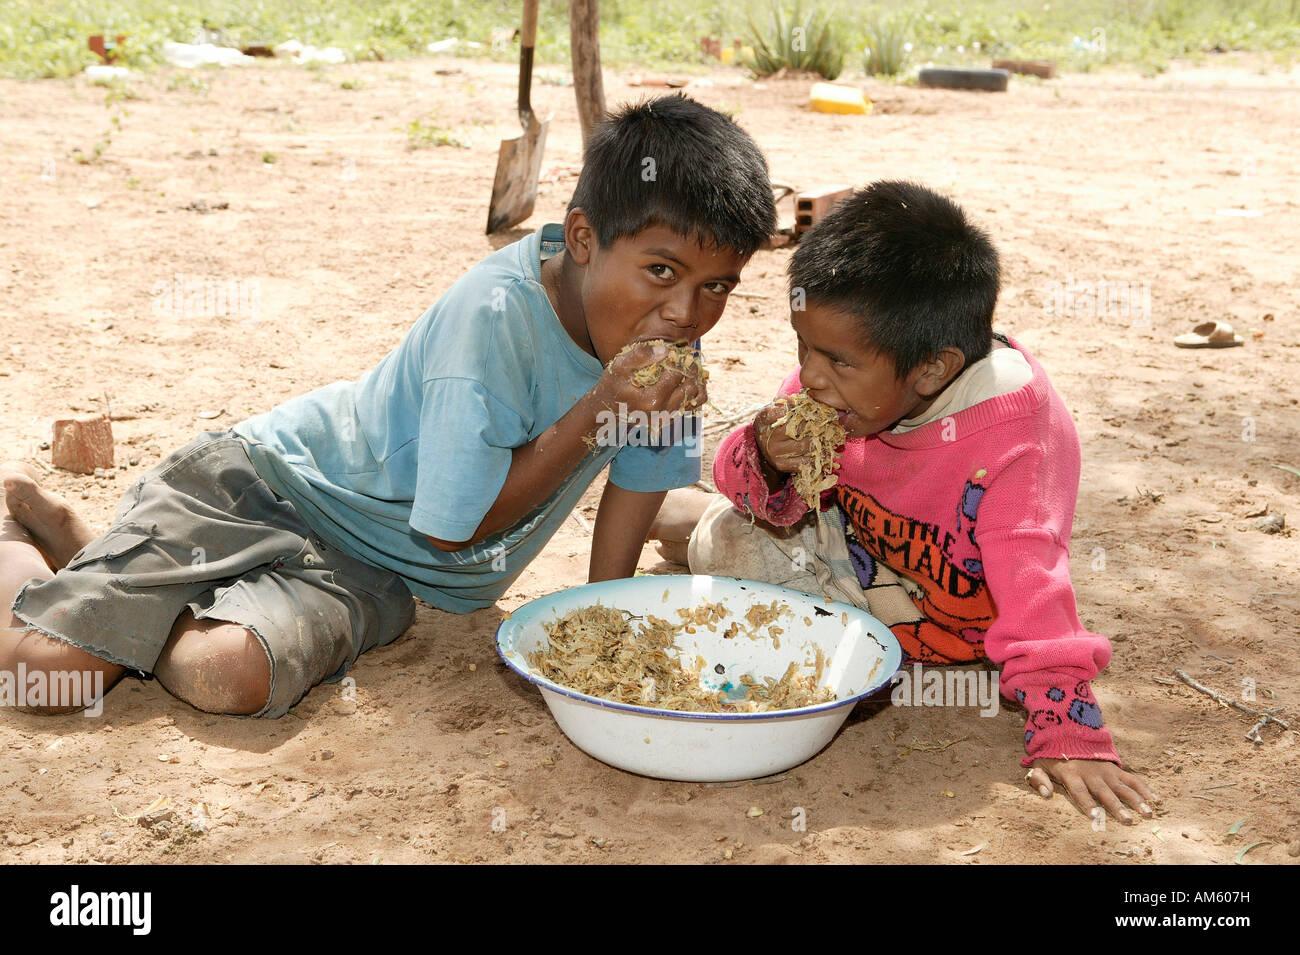 Children eating fresh, hackled sugar cane, Nivaclé native American, Jothoisha, Chaco, Paraguay, South America - Stock Image